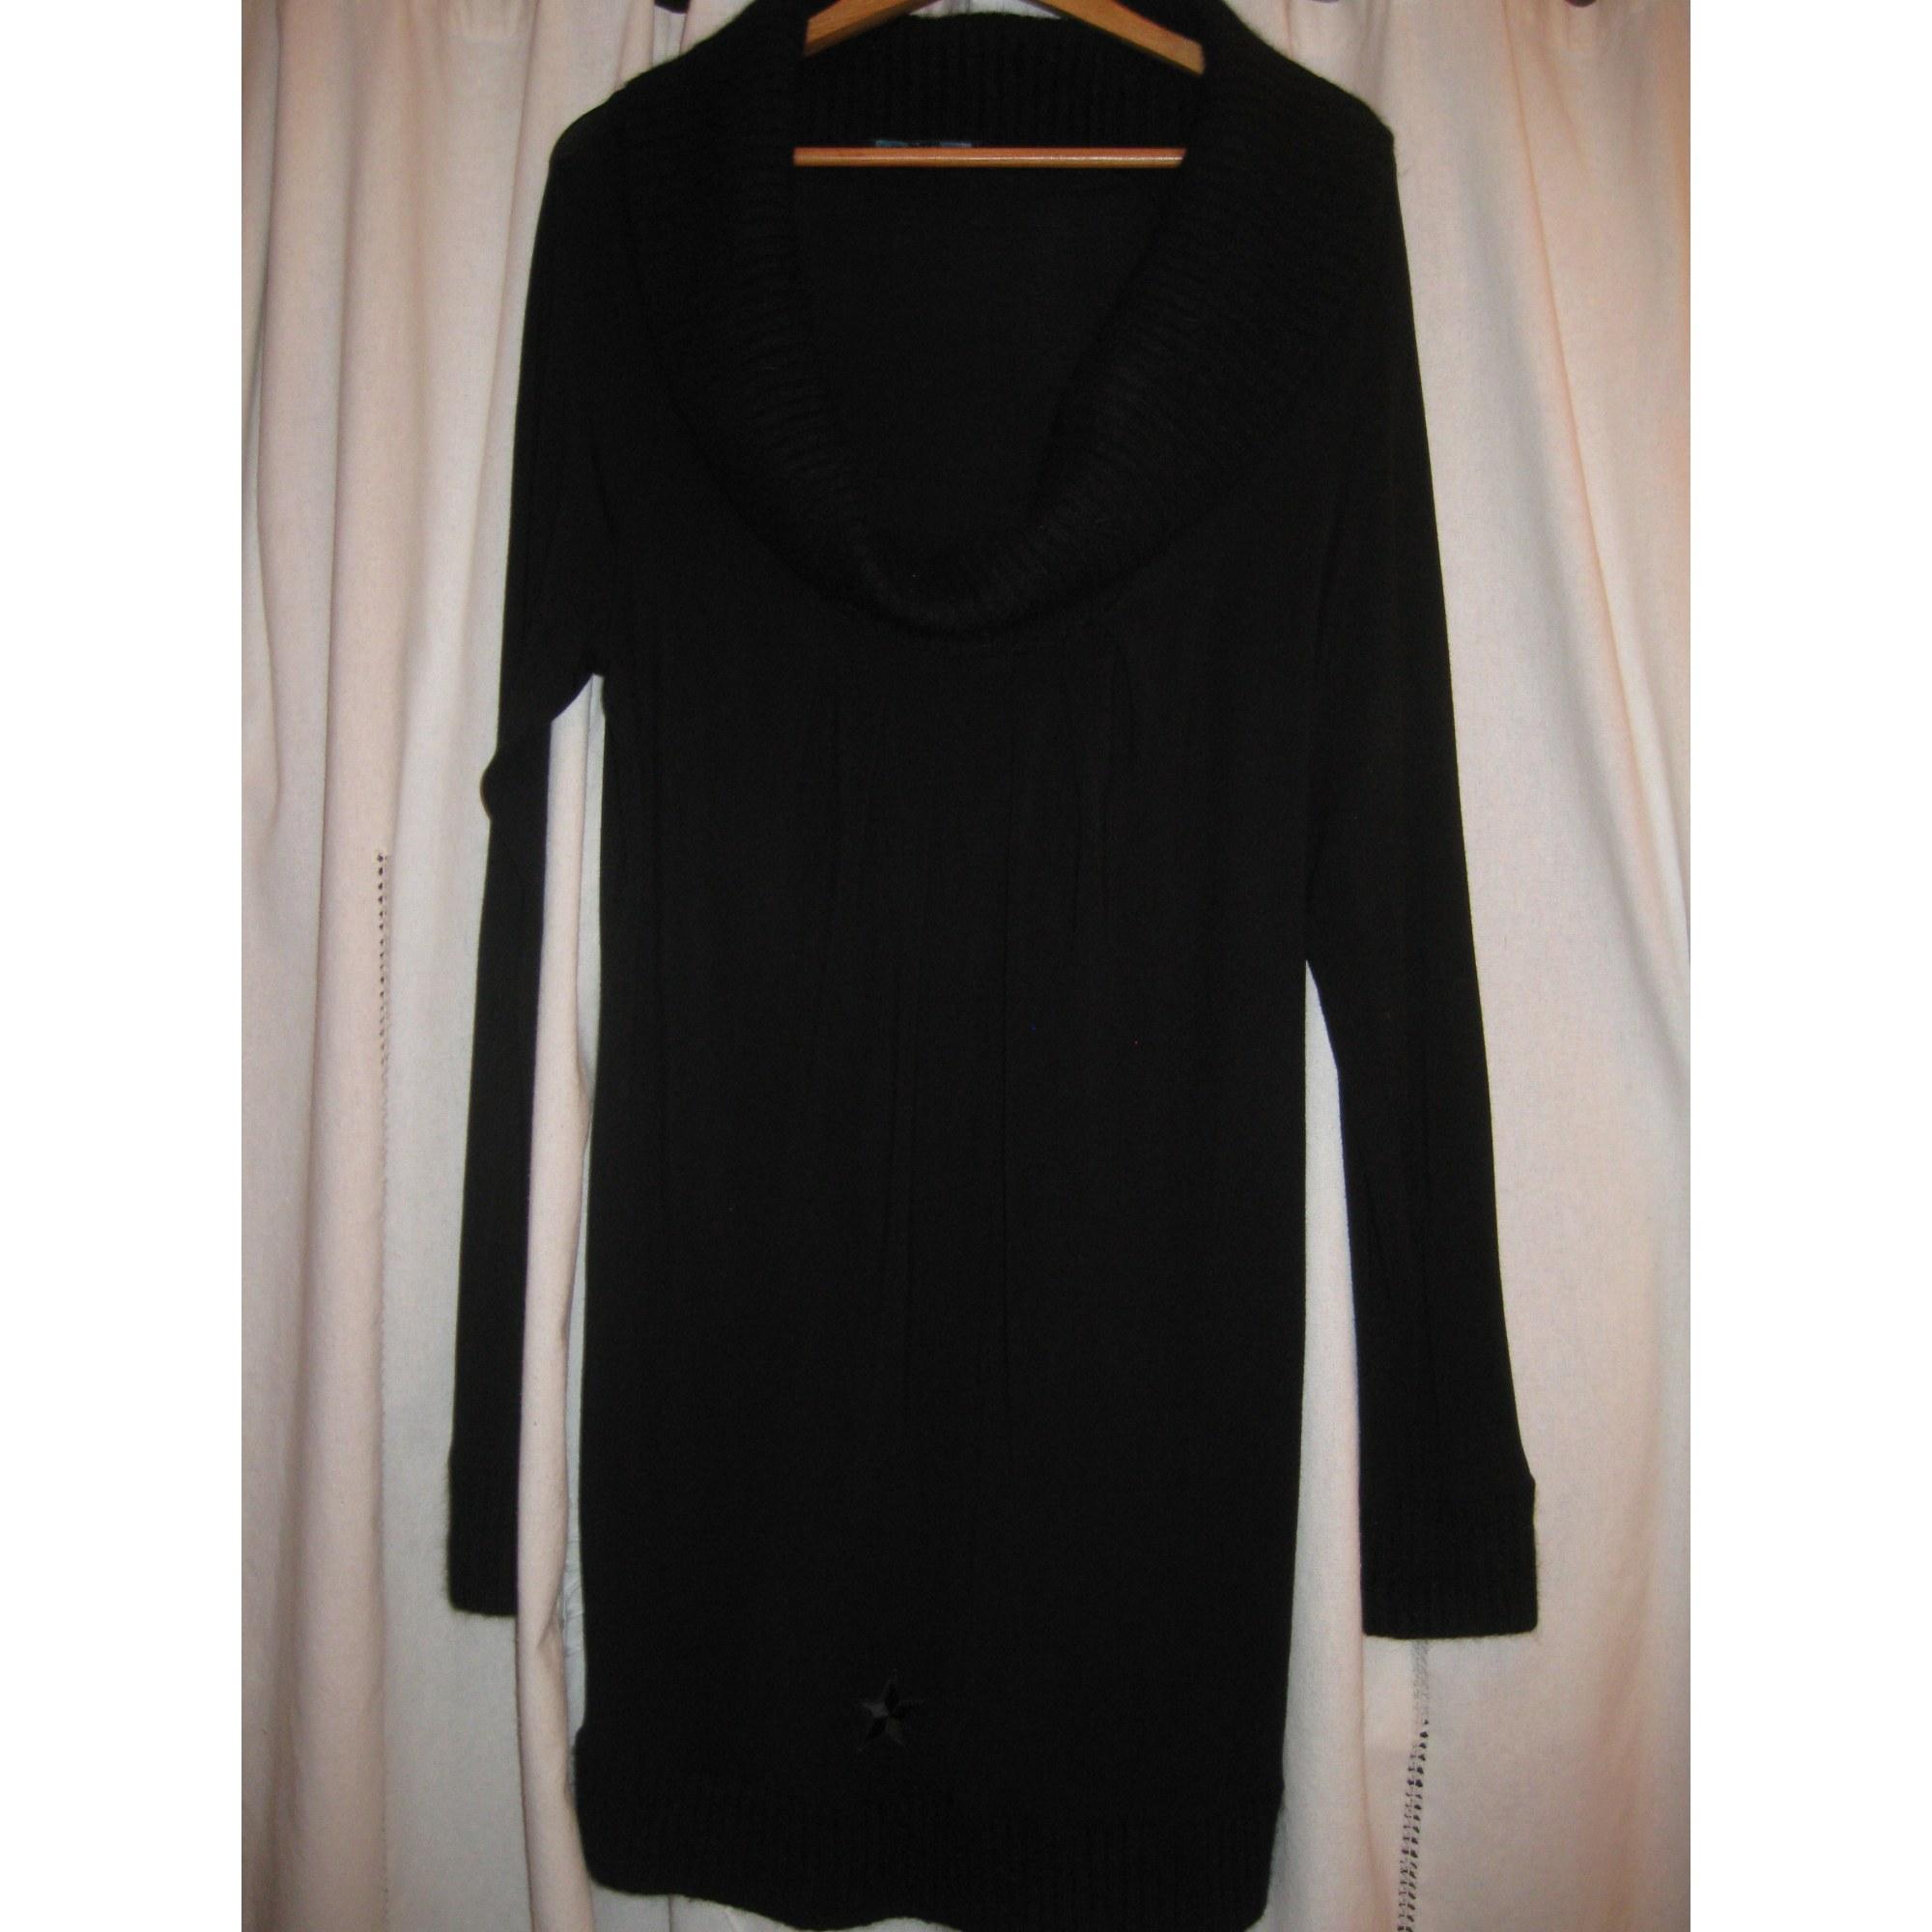 fae8dd29eb8 Robe tunique GUESS 46 (XXL) noir vendu par Maju22 - 4642097